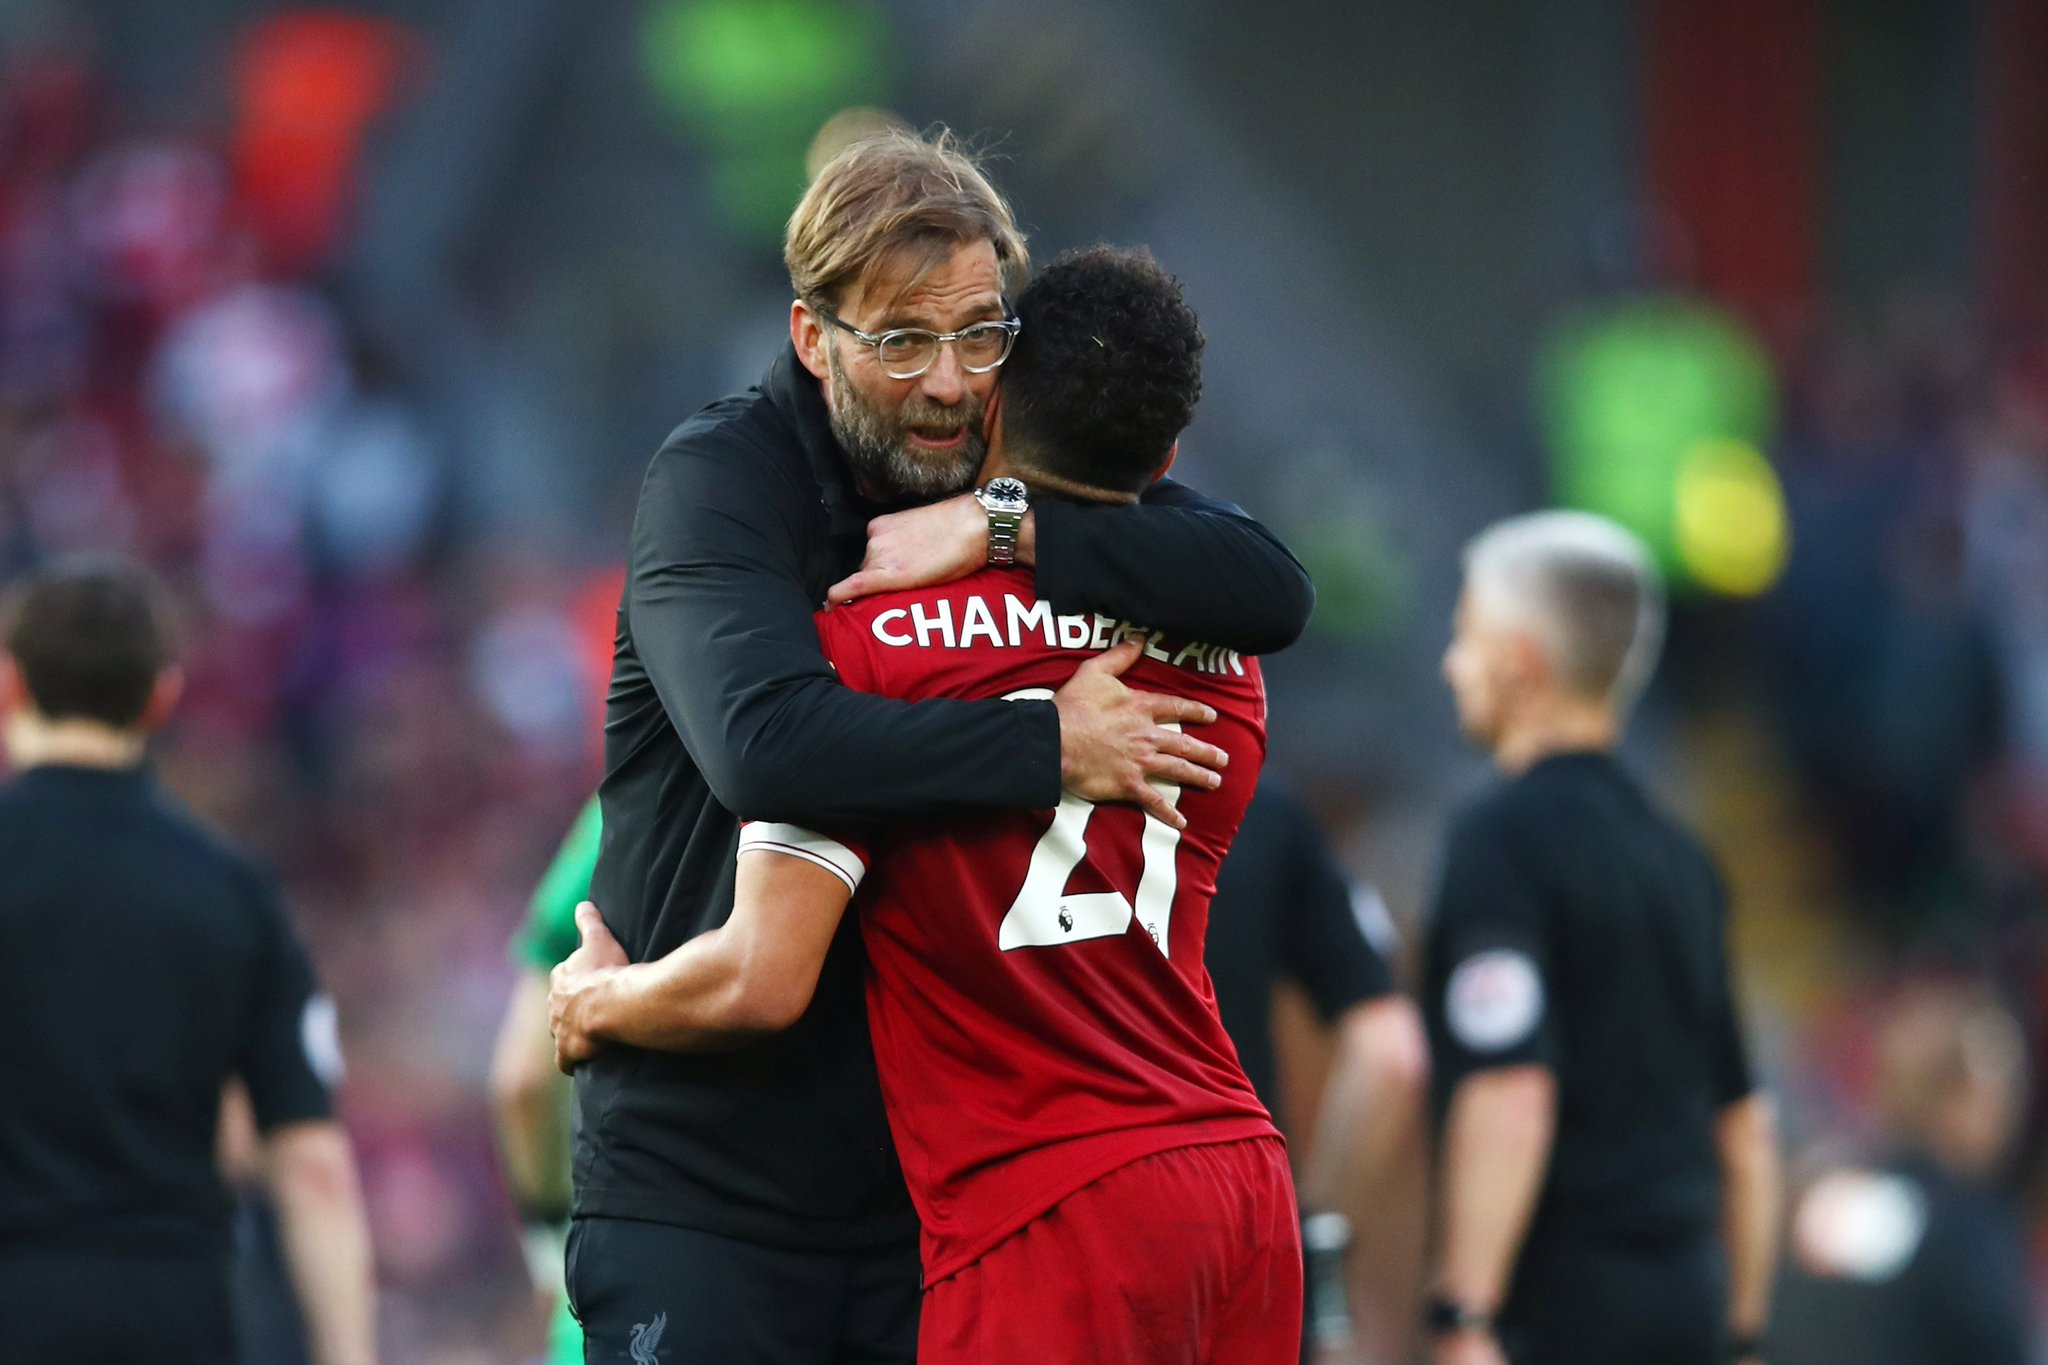 �� 'The mood is so positive in Liverpool.'  Jürgen Klopp reflects on an intense 14 days: https://t.co/ldQhEAjN4e https://t.co/DhNBqmZ7Fa